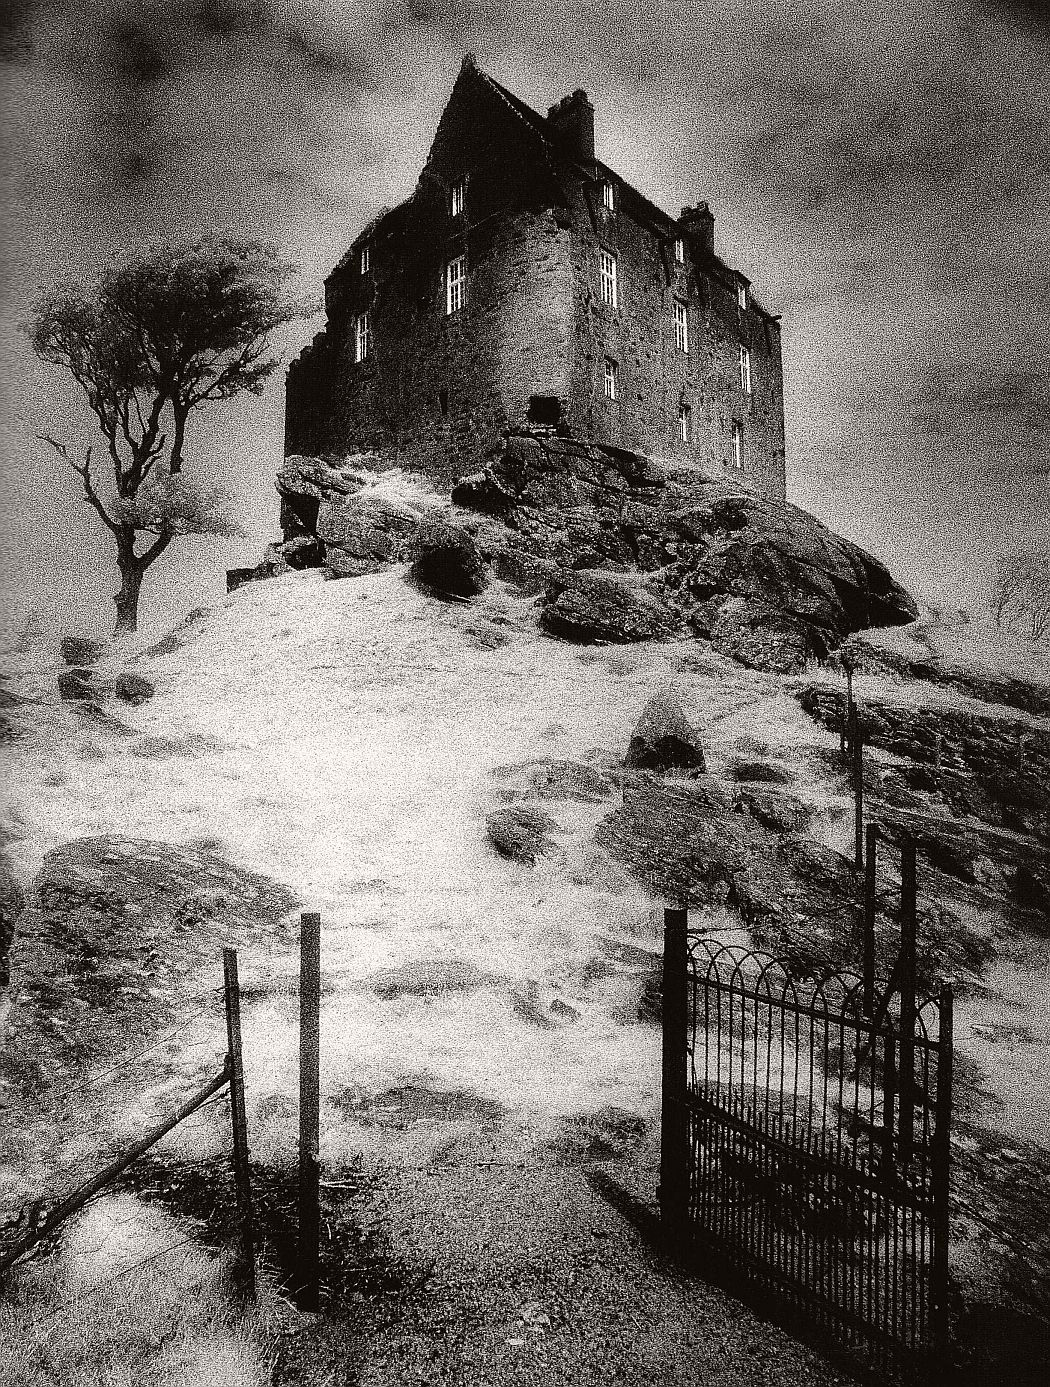 surreal-architecture-photographer-simon-marsden-06